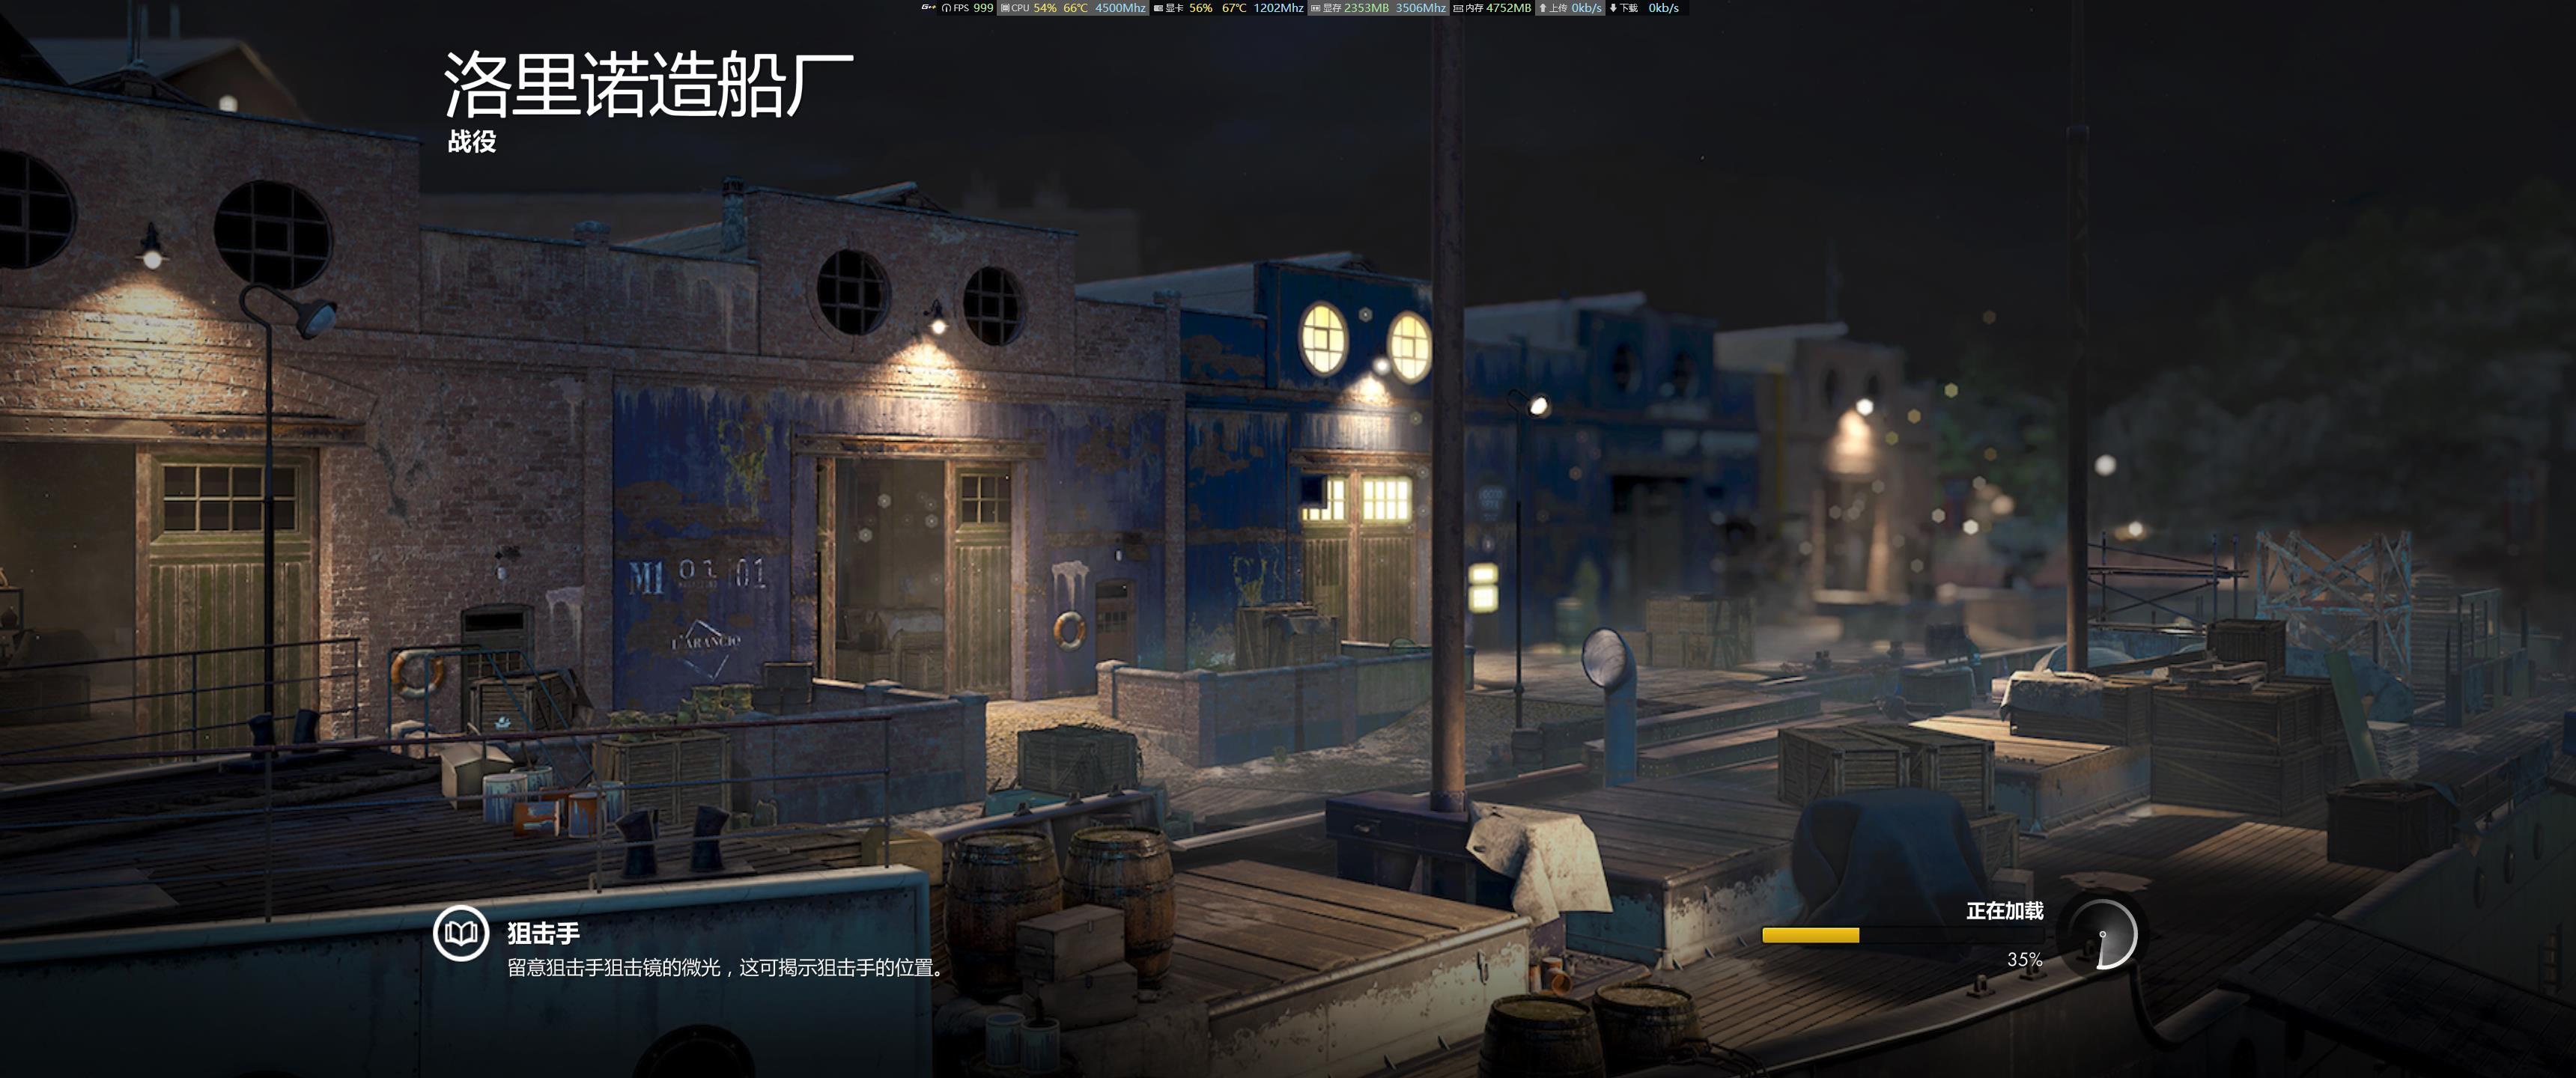 SniperElite4_DX11-01-20-34-07.jpg